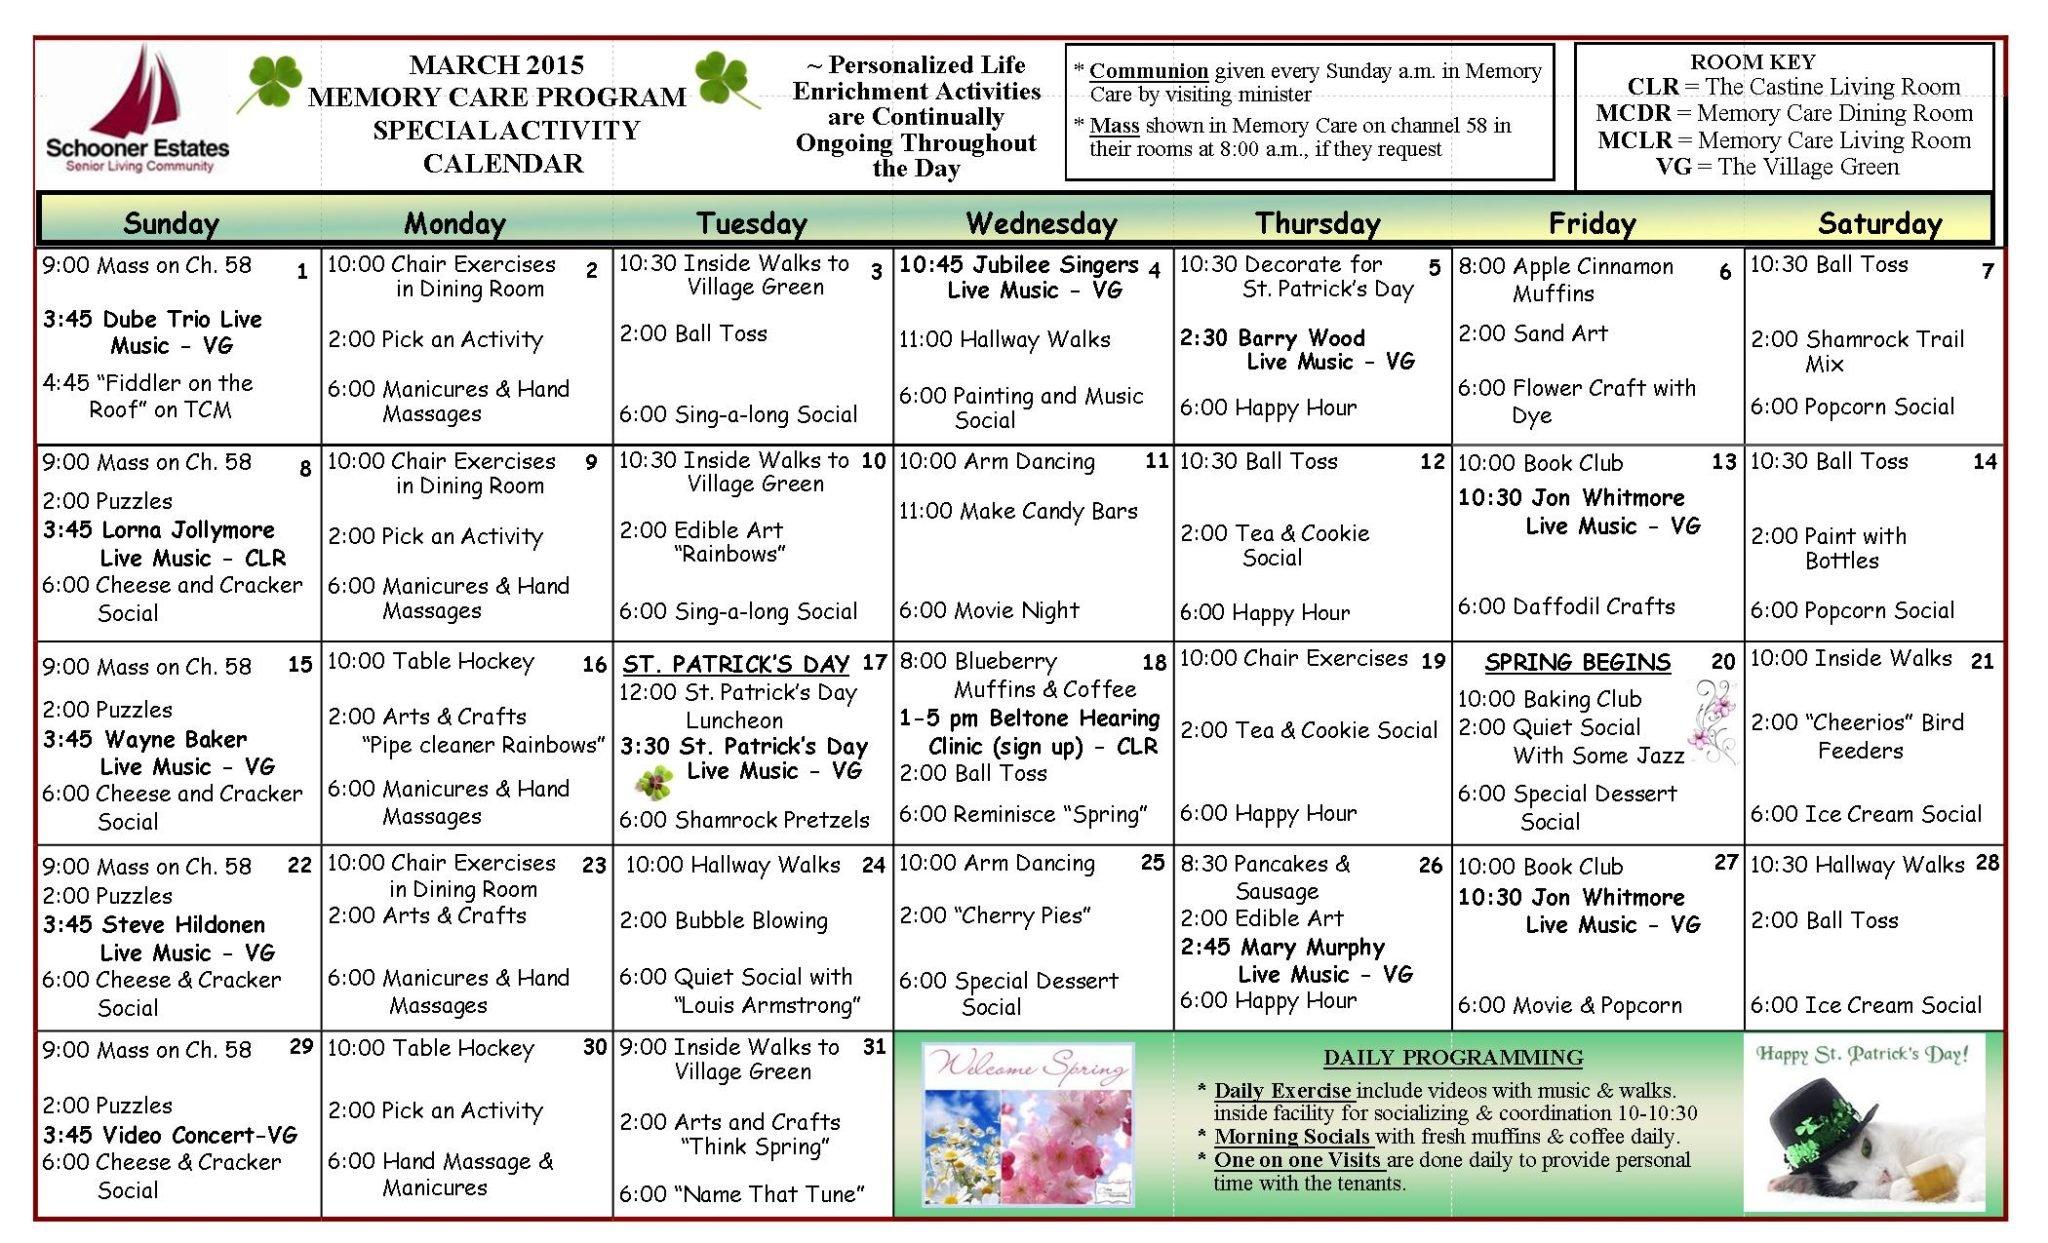 Memory Care Calendar March 2015